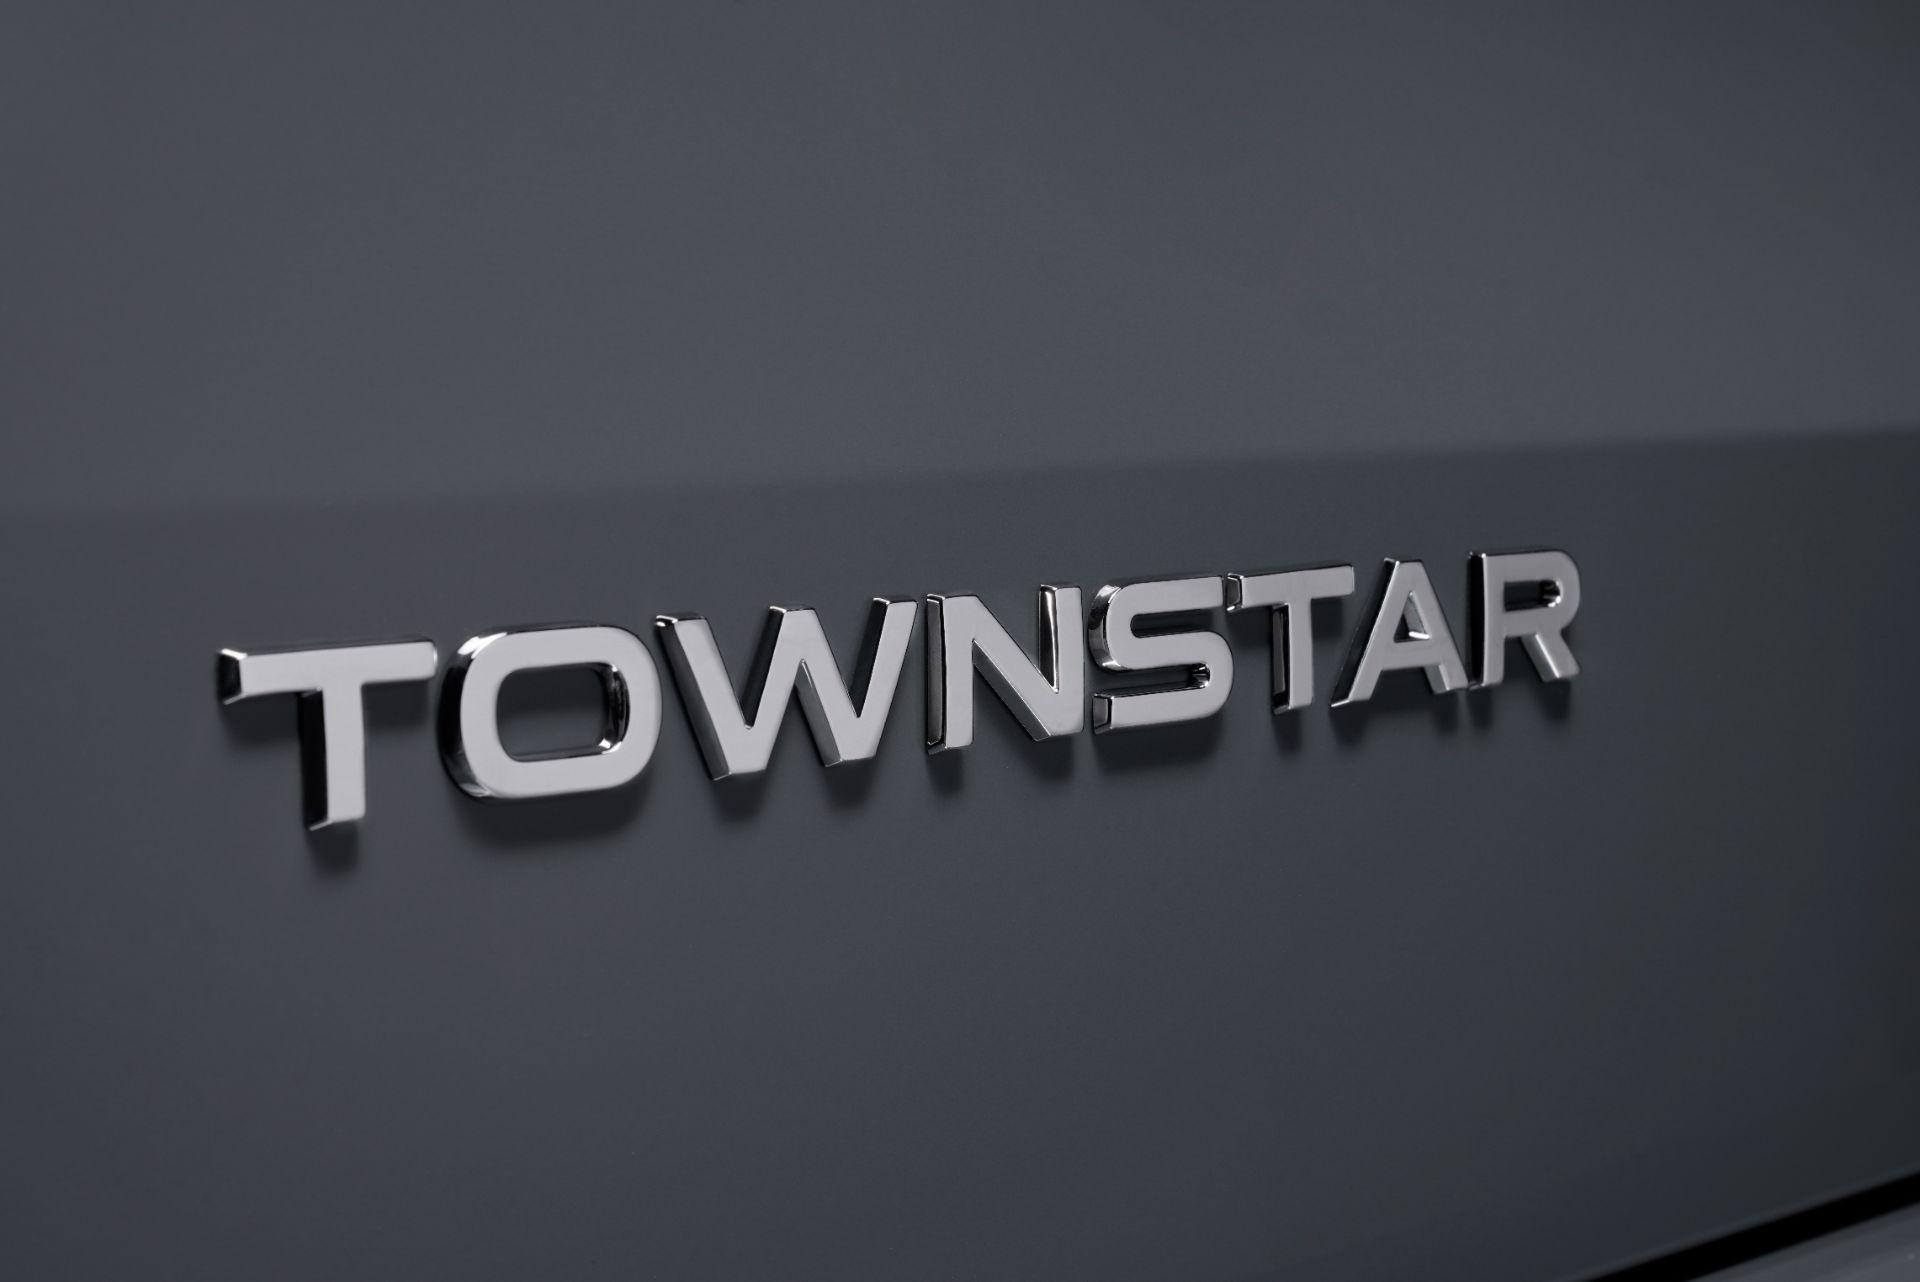 2022-Nissan-Townstar-petrol-van-dynamic-28